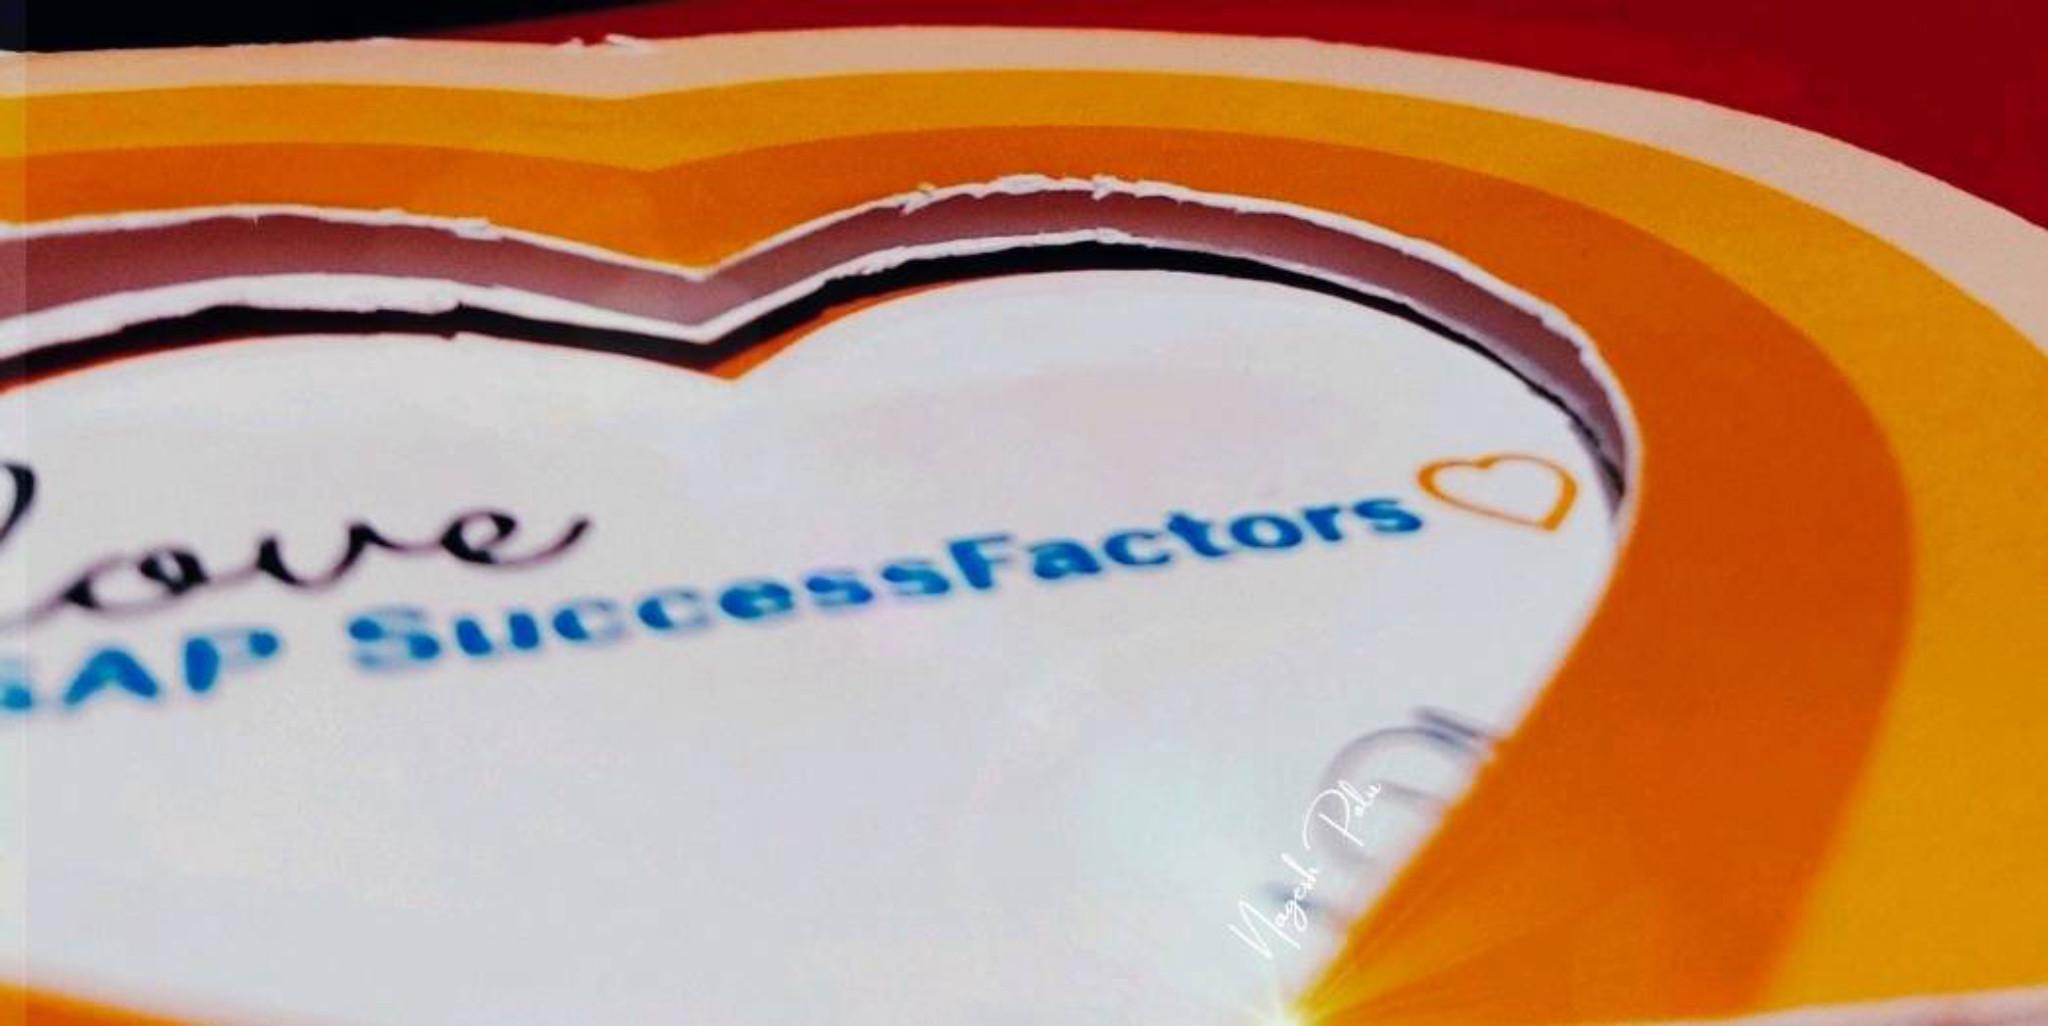 SAP SuccessFactors bowl icon